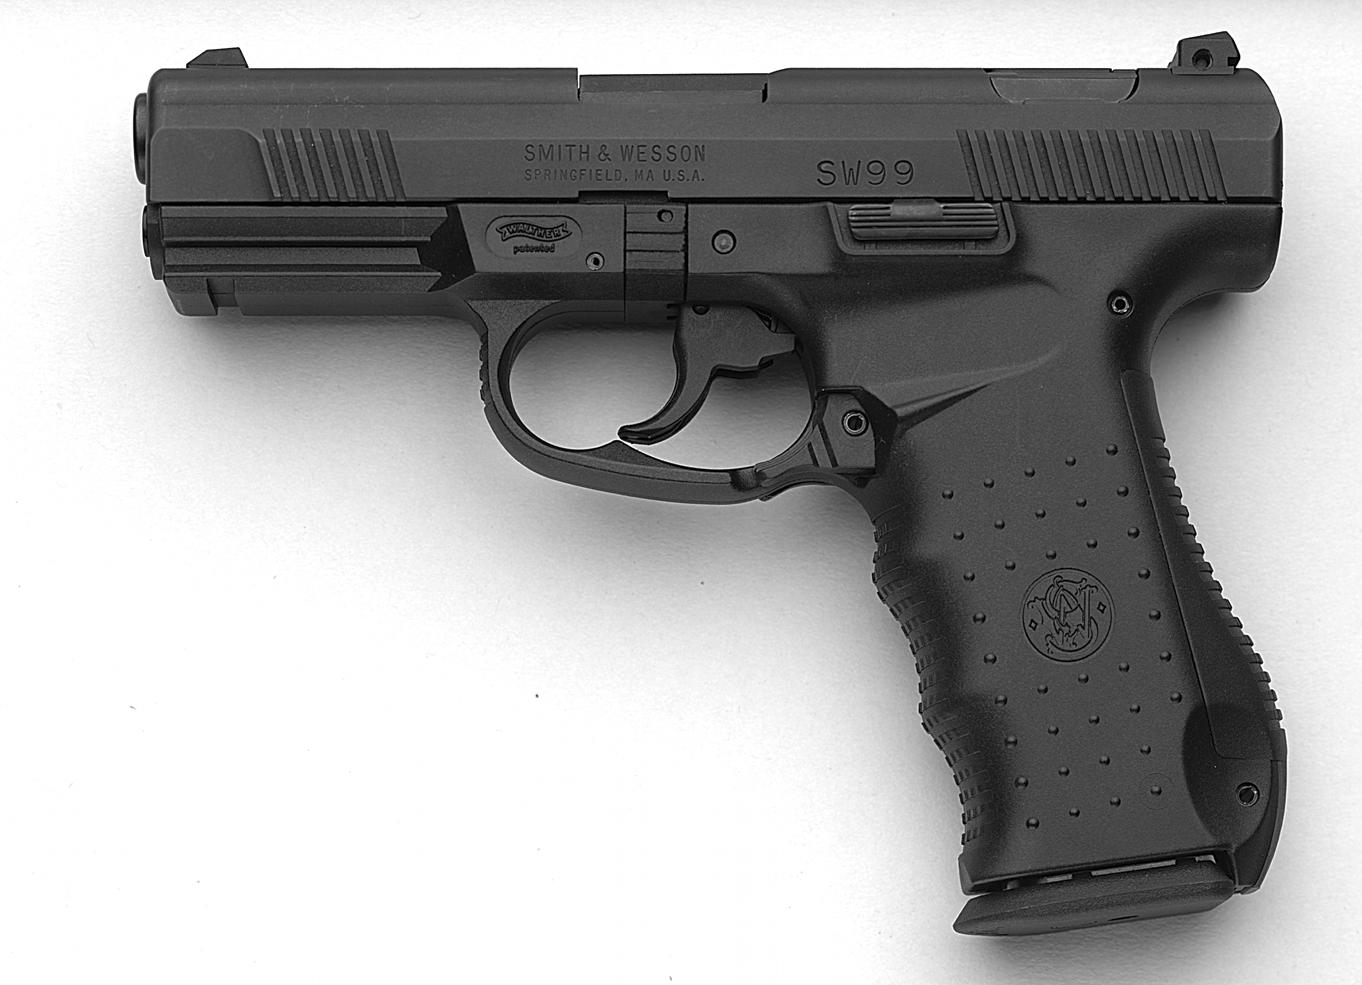 Smith & Wesson SW99